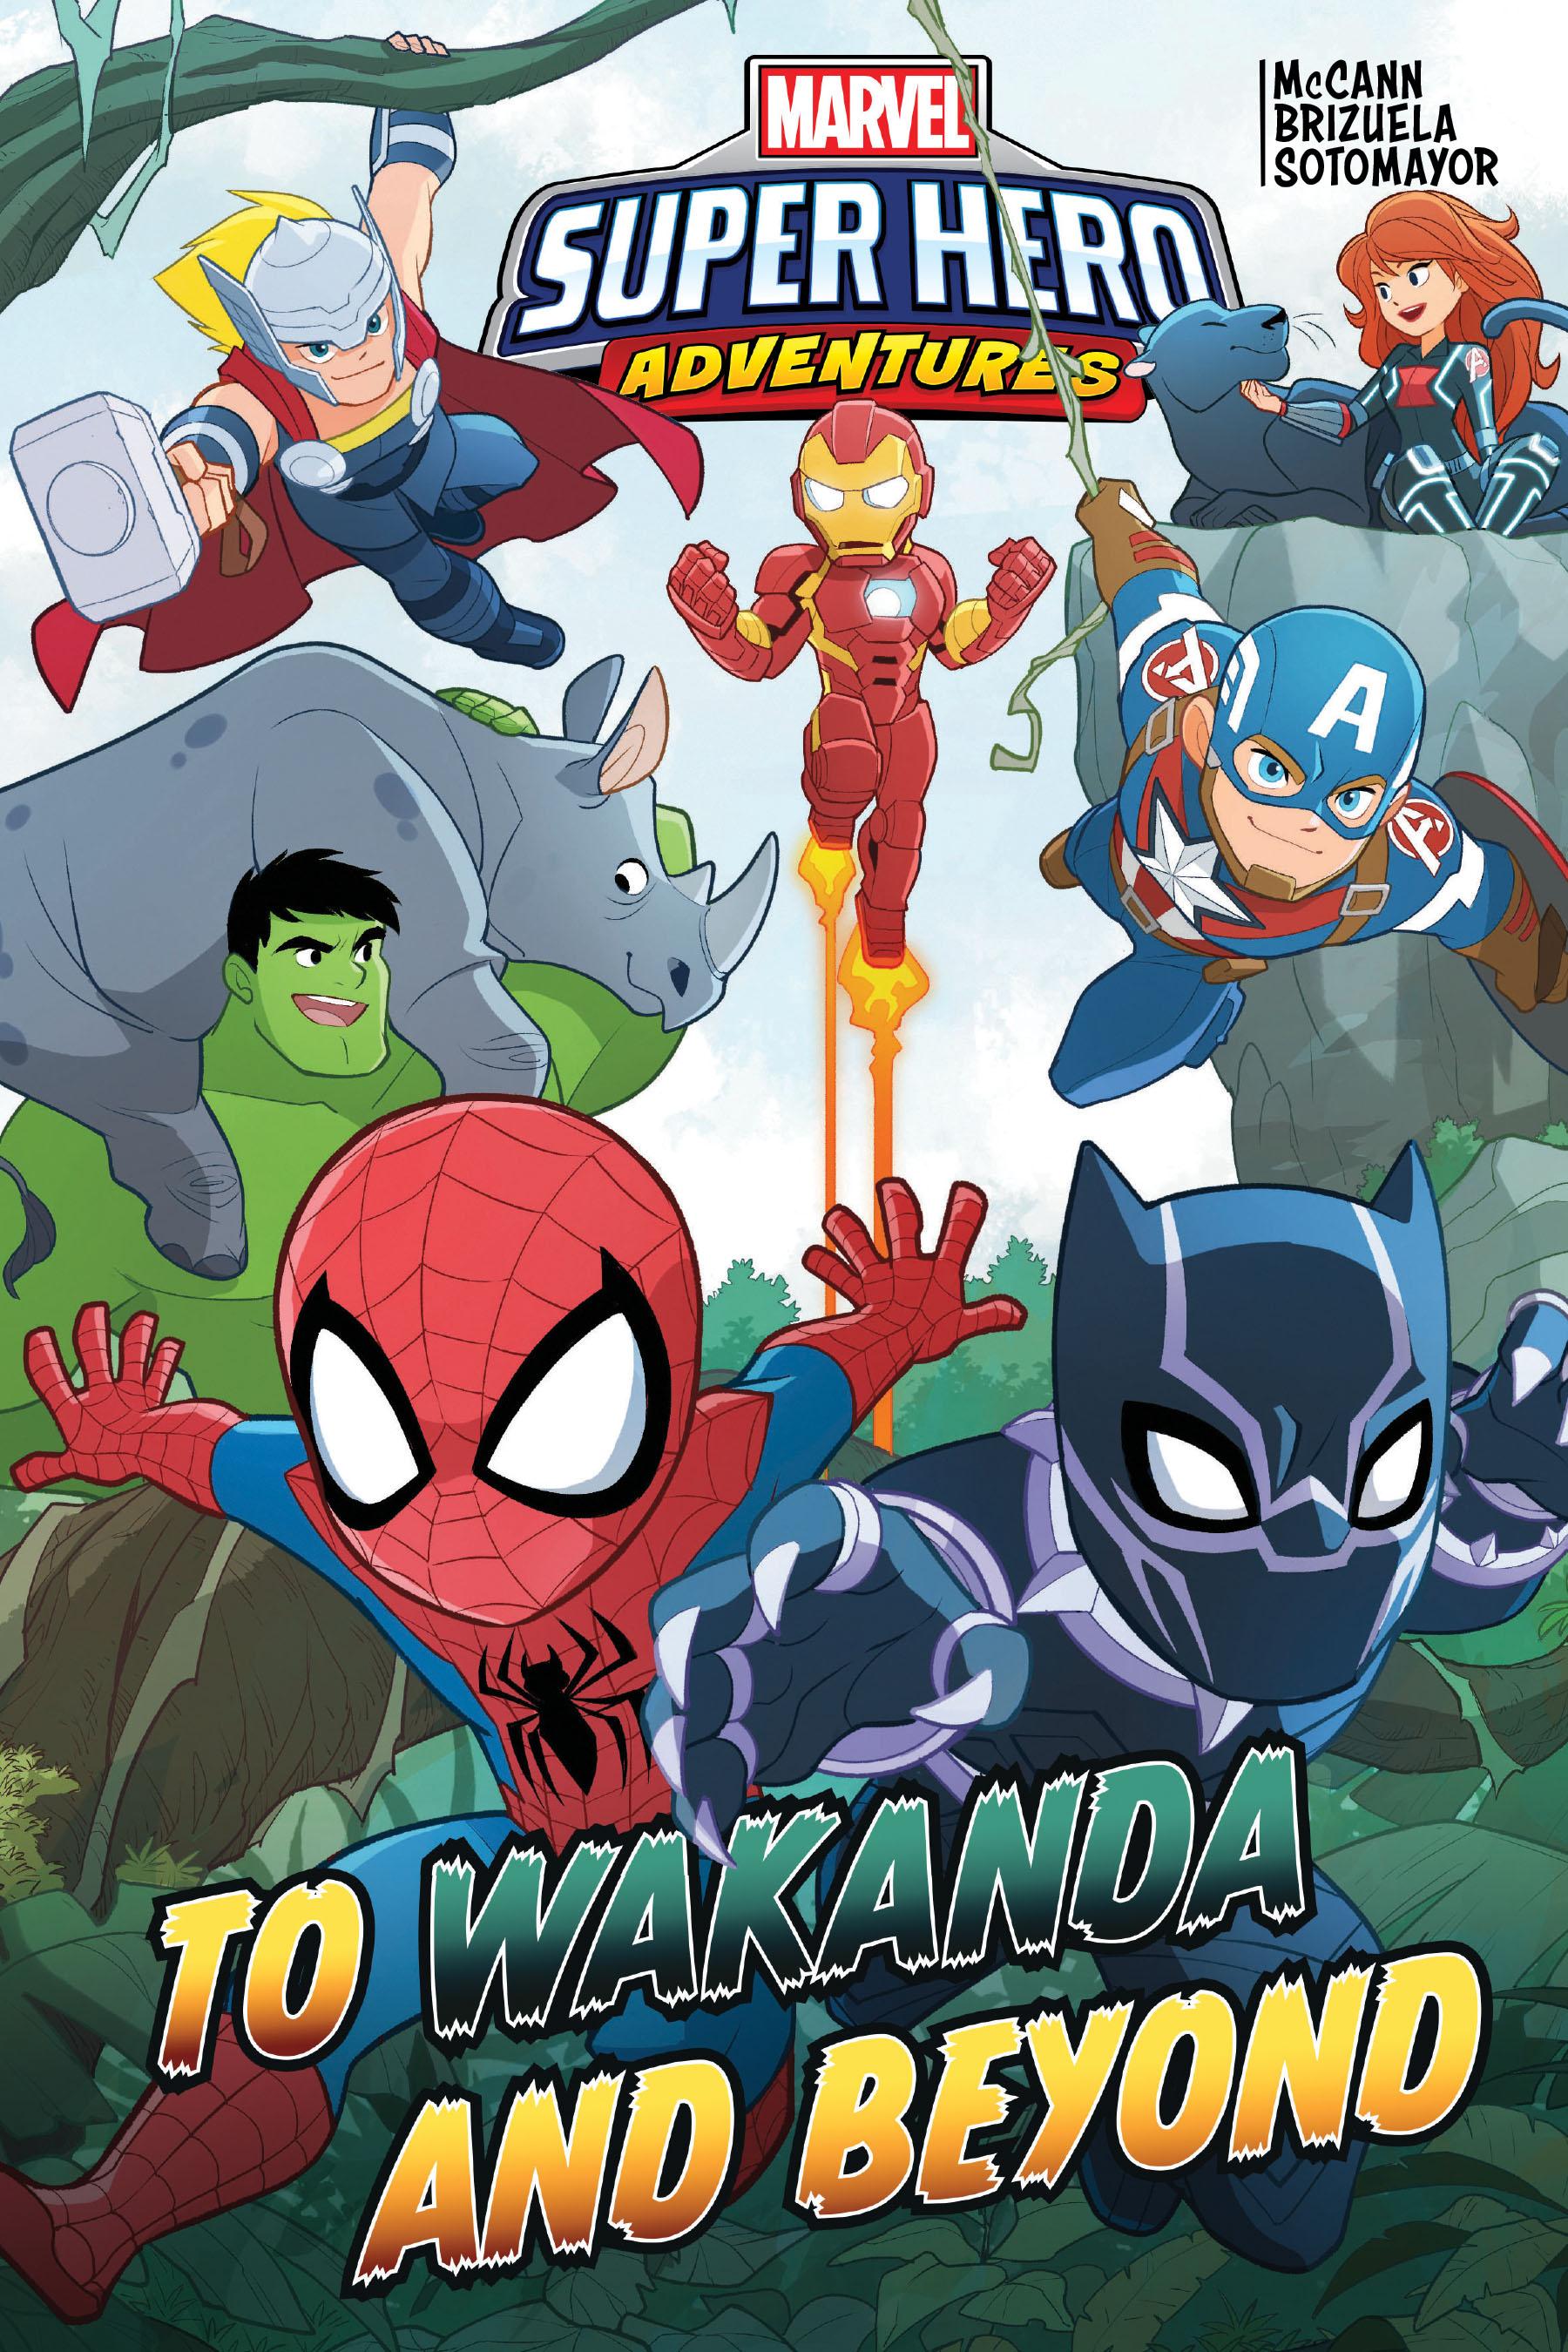 Marvel Super Hero Adventures: To Wakanda and Beyond (Trade Paperback)